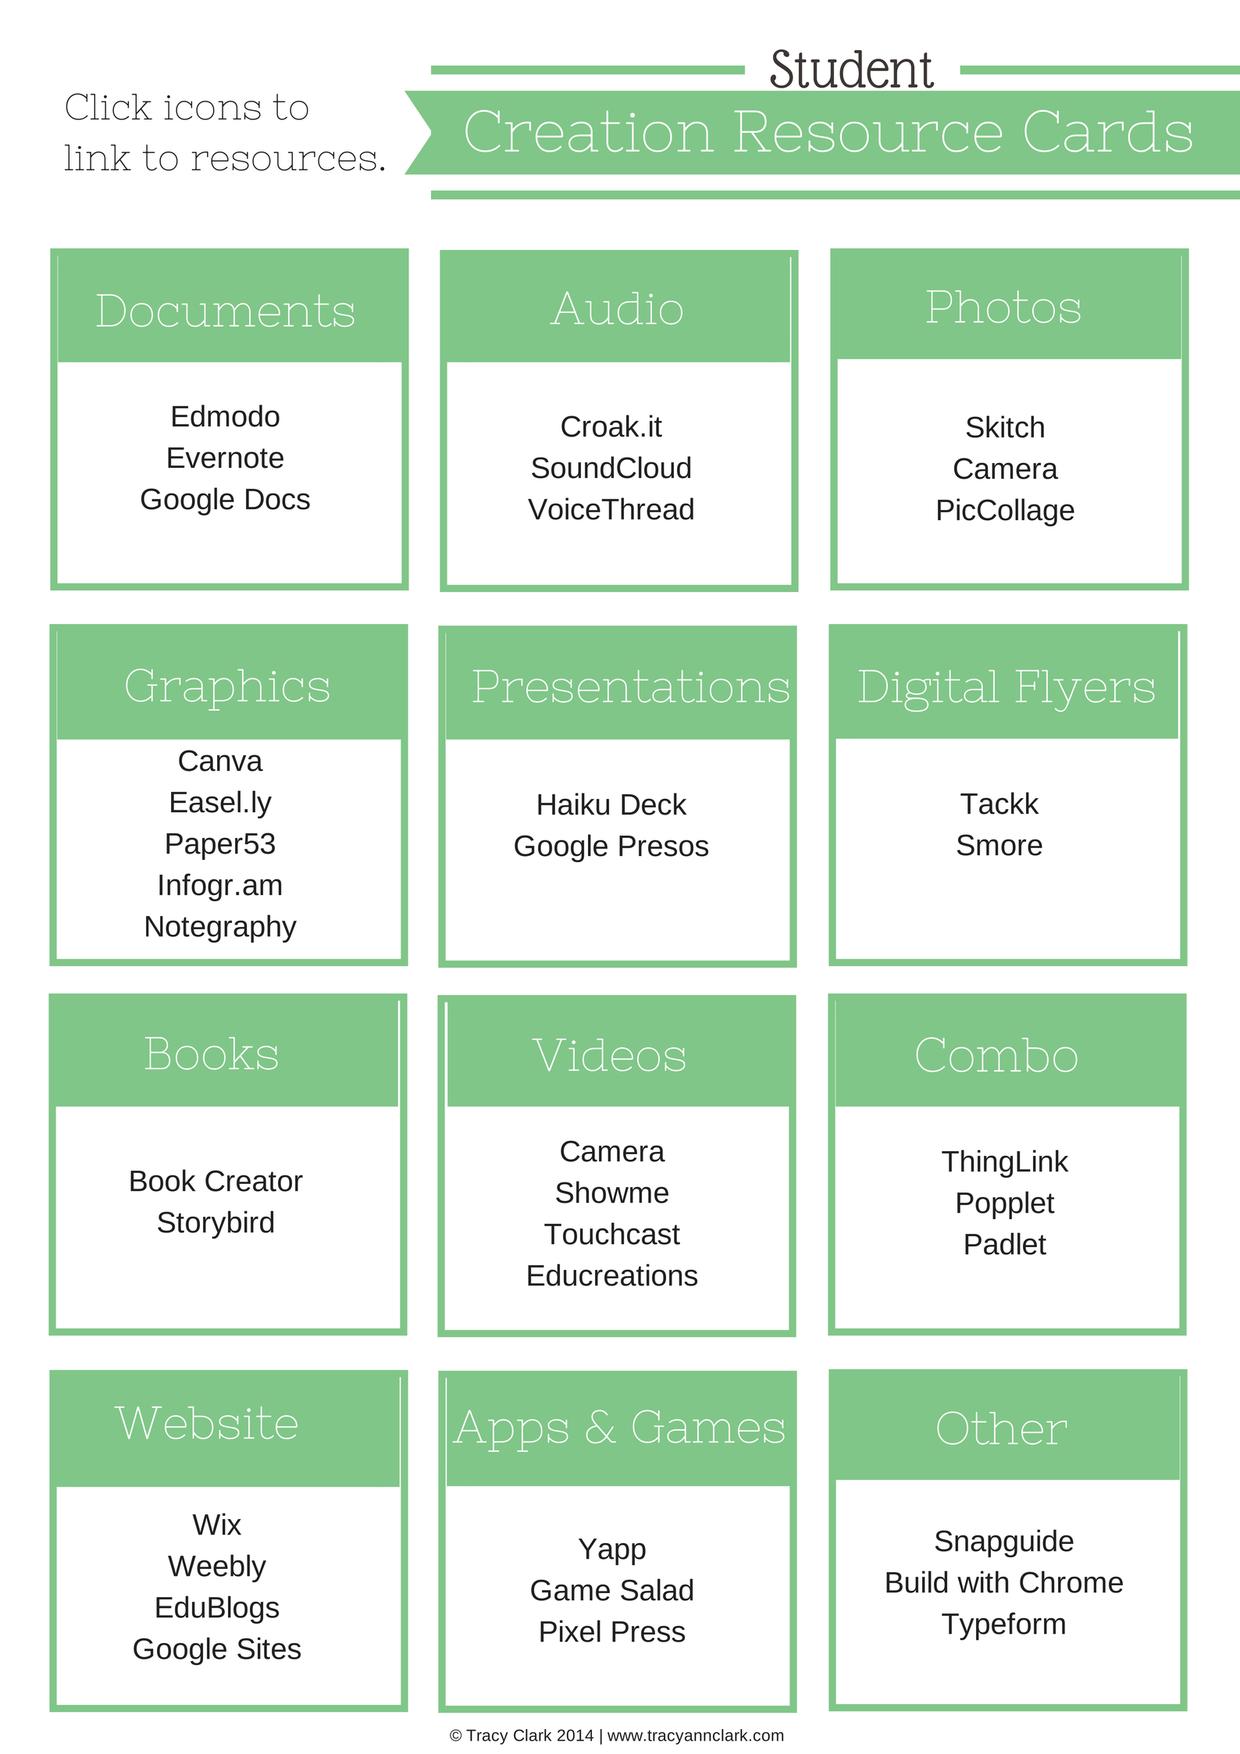 Creation Cards for Student Tech Entrepreneur Camp 1.0